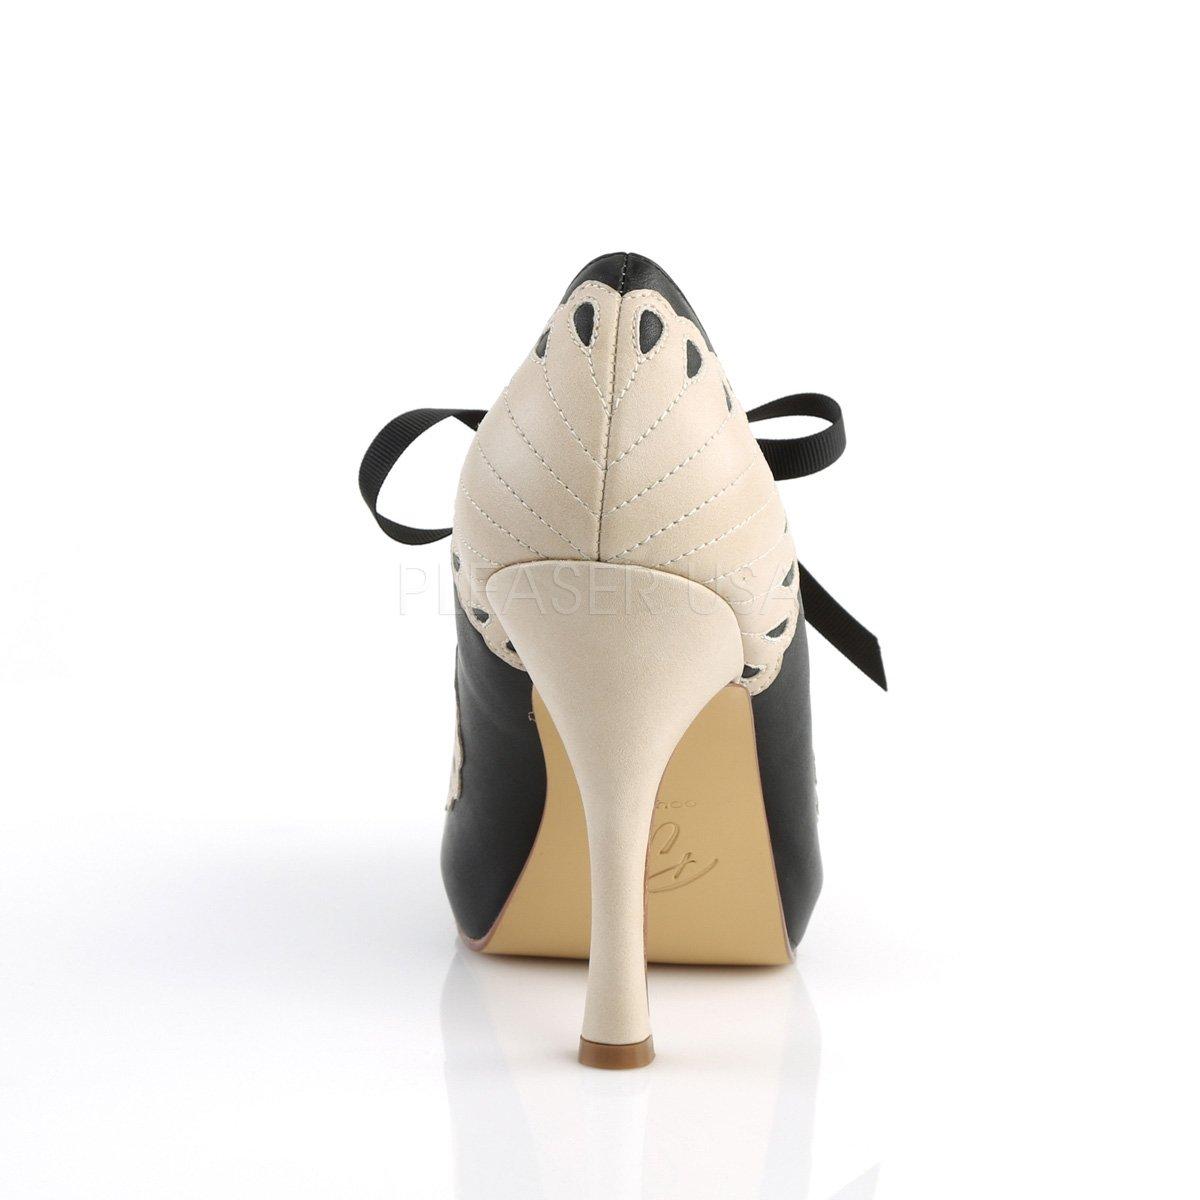 Pinup Couture Couture Couture Damen Maryjane Pumps Cutiepie-05 schwarz Creme b169d3